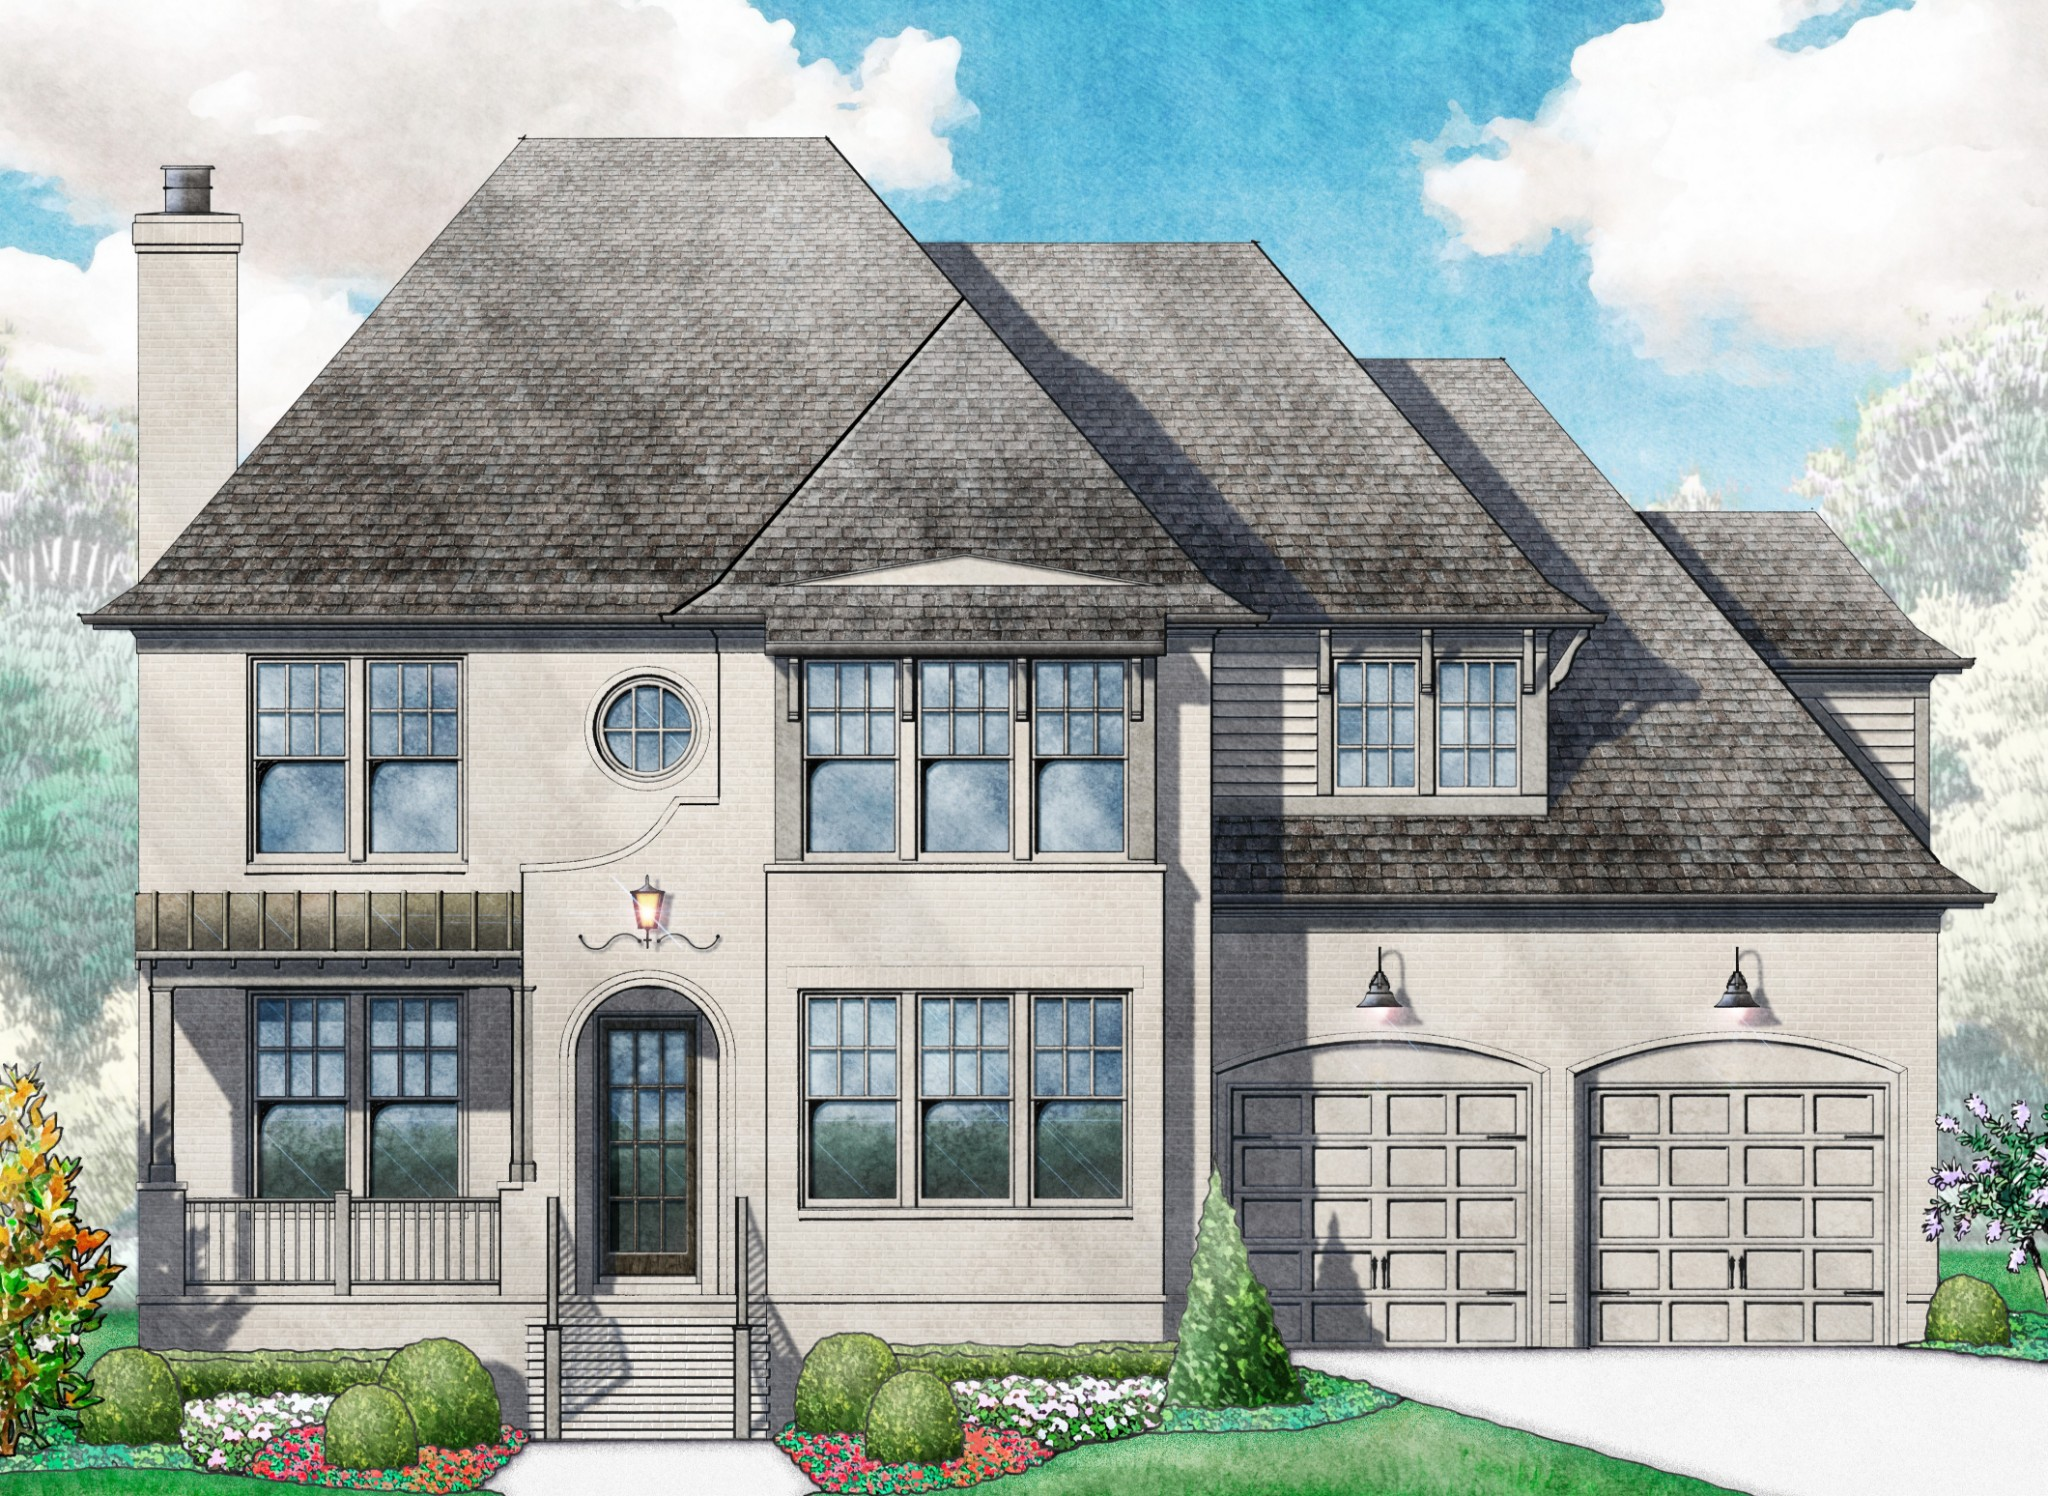 919 Cheltenham Ave, Lot # 2141 Property Photo - Franklin, TN real estate listing